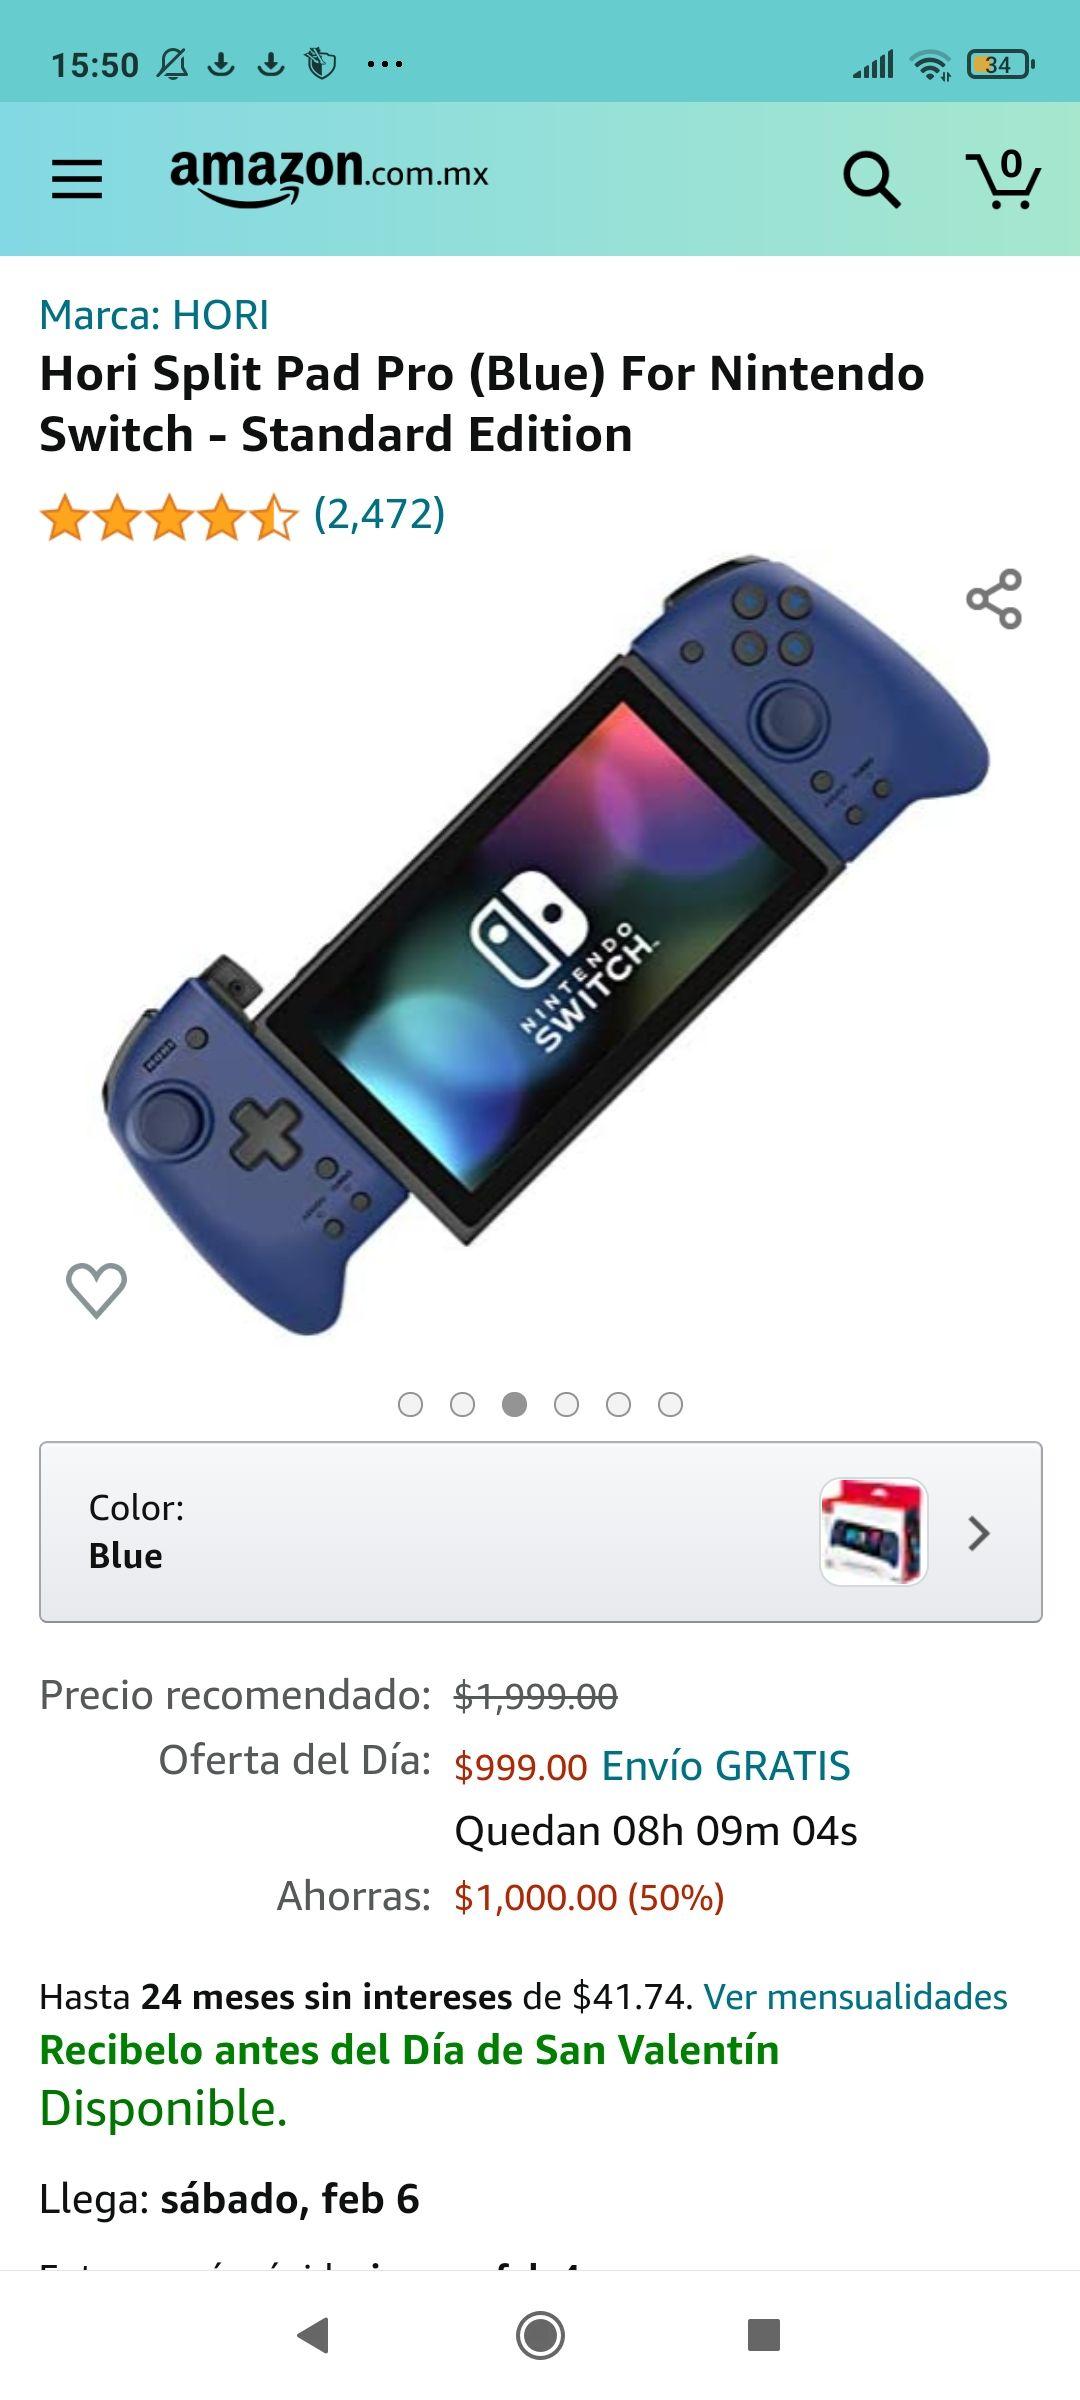 Amazon: Hori Split Pad Pro (Blue) For Nintendo Switch - Standard Edition